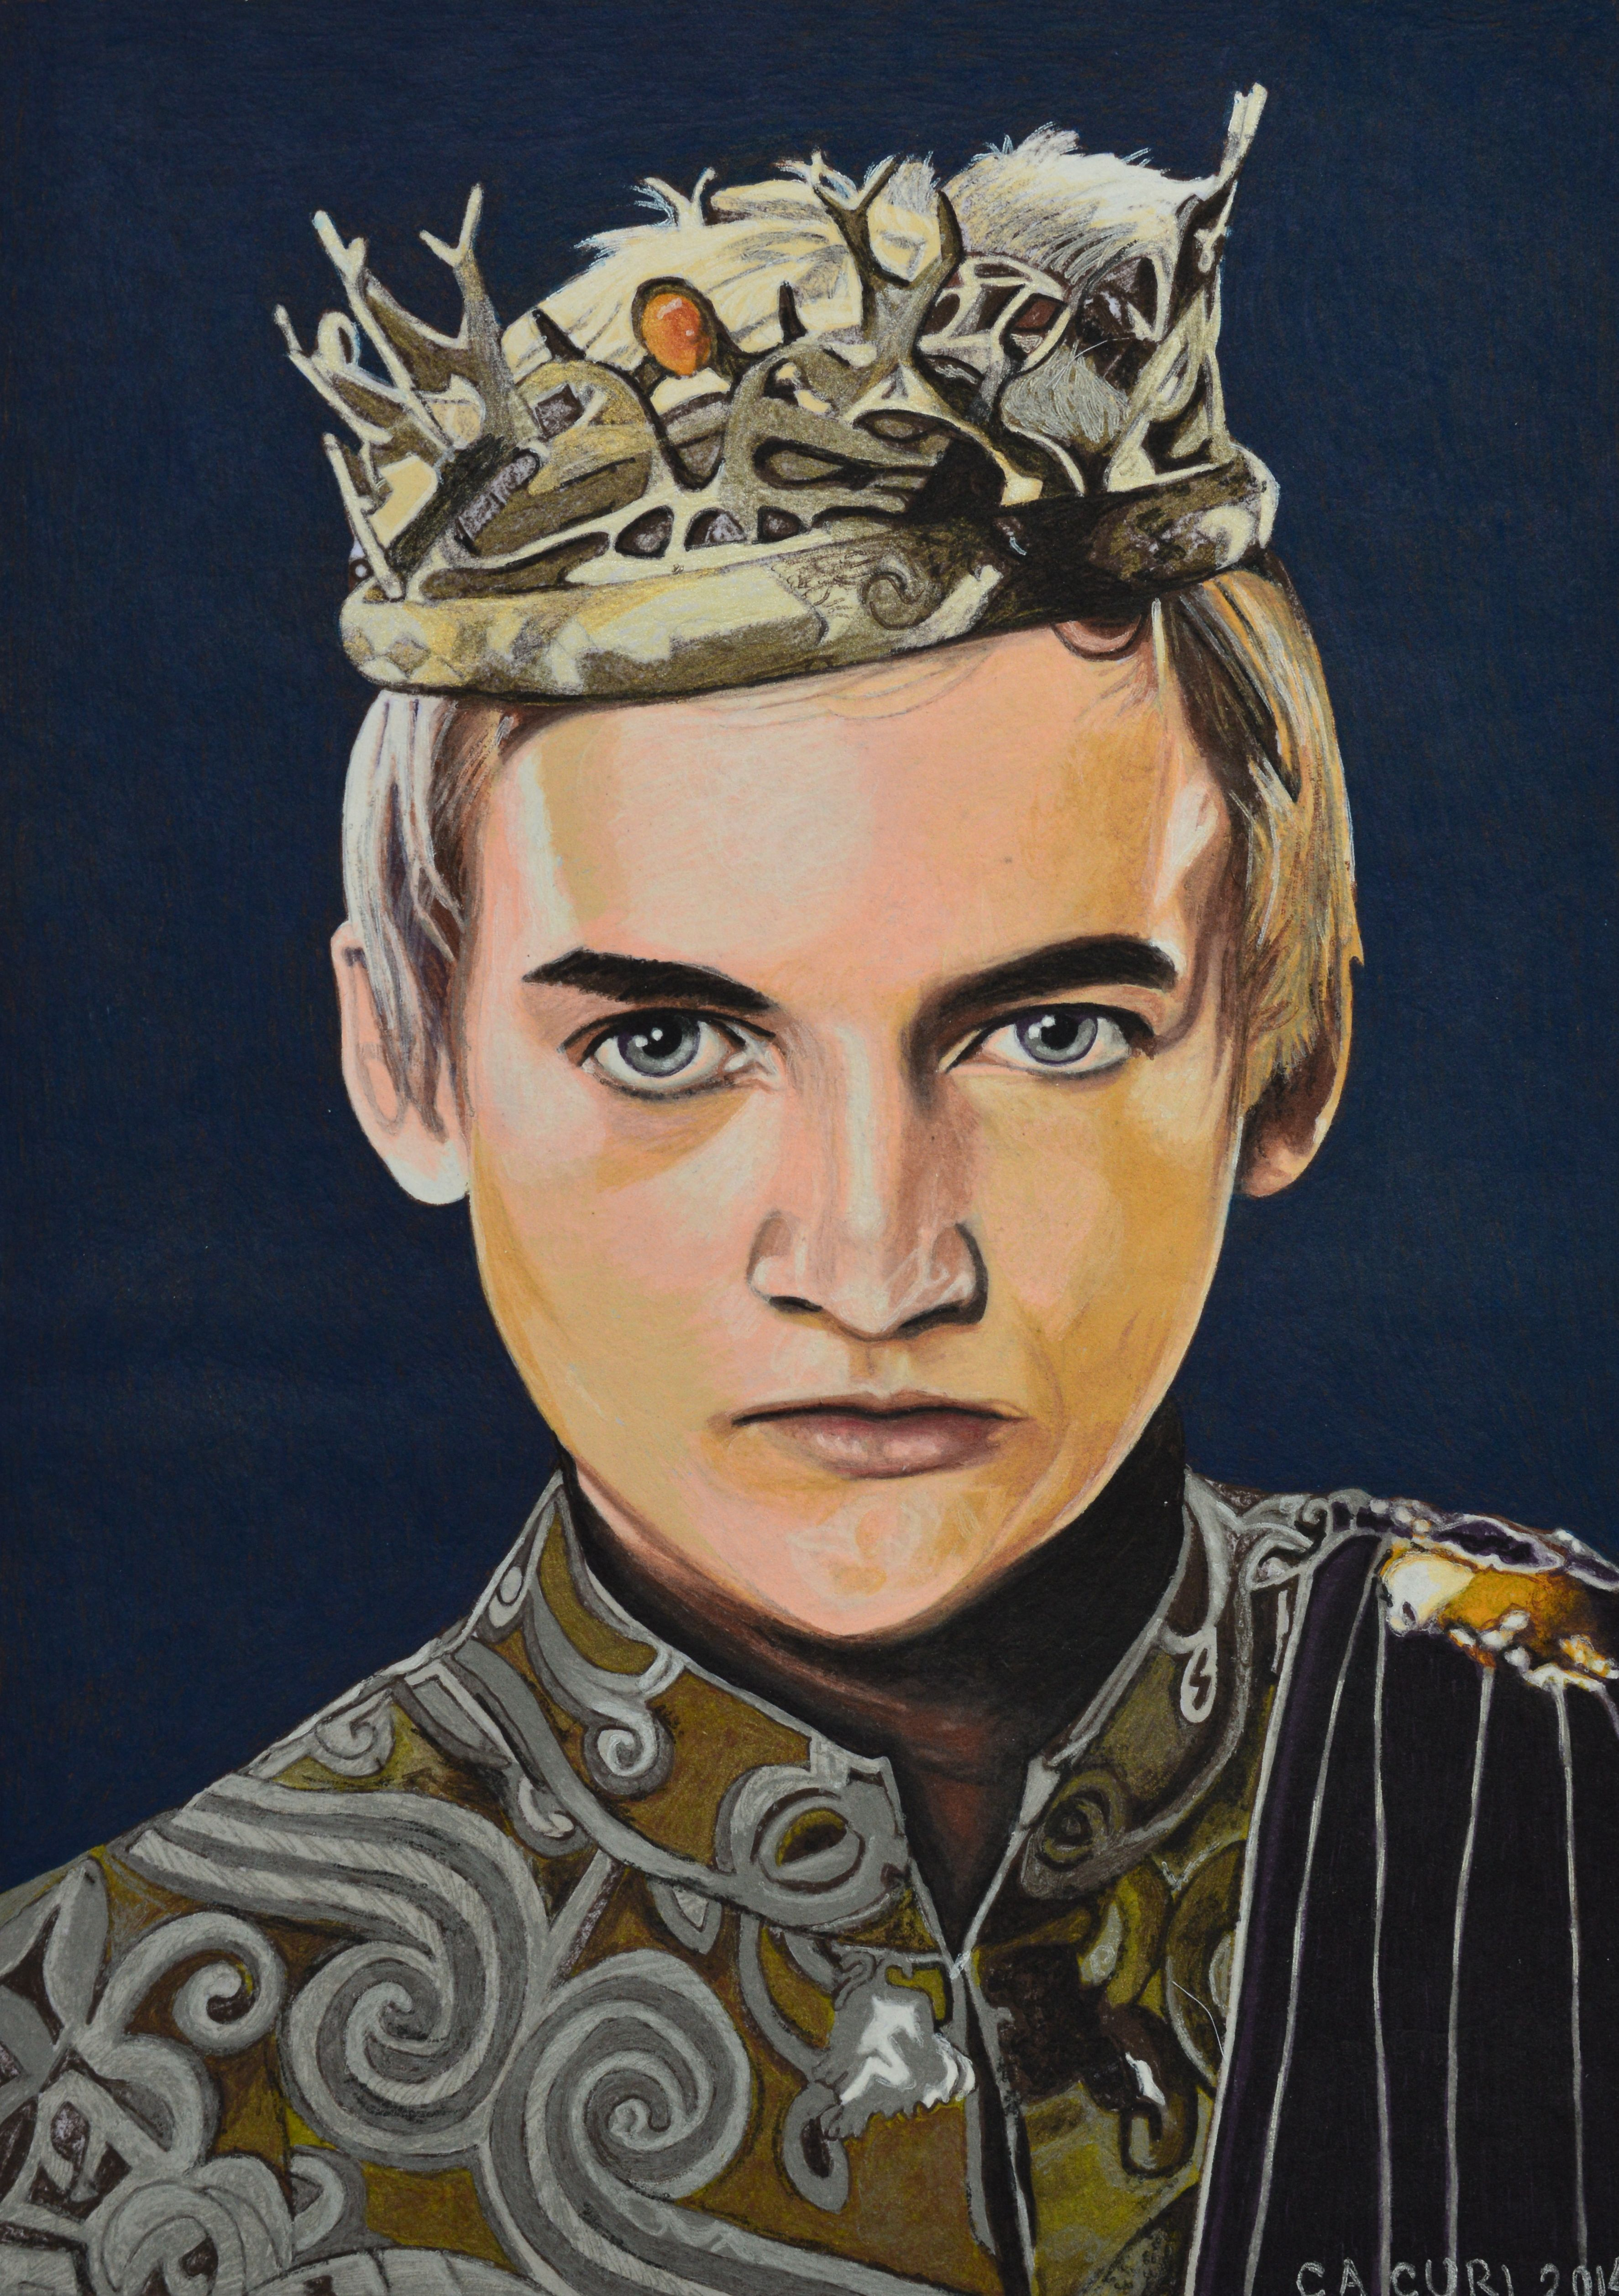 Jack Gleeson as Joffrey Baratheon from Game of thrones ...